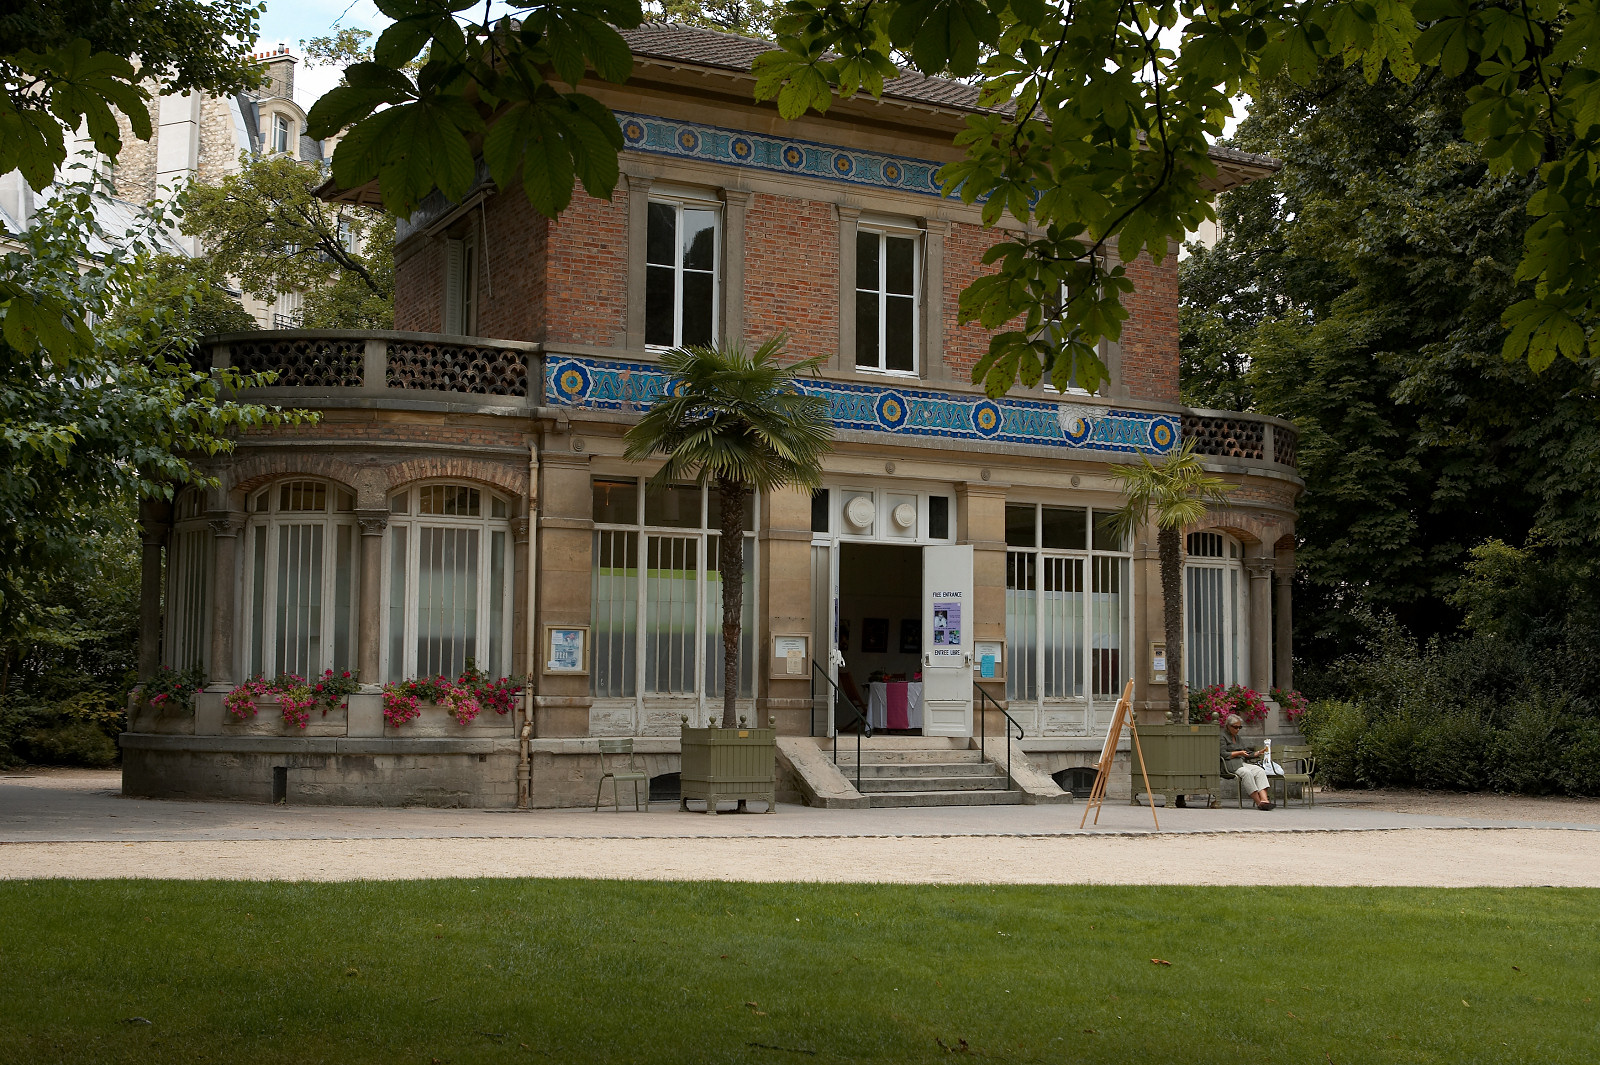 Miriam peters rouyer artiste peintre exposition 6 au 17 - Exposition jardin du luxembourg ...